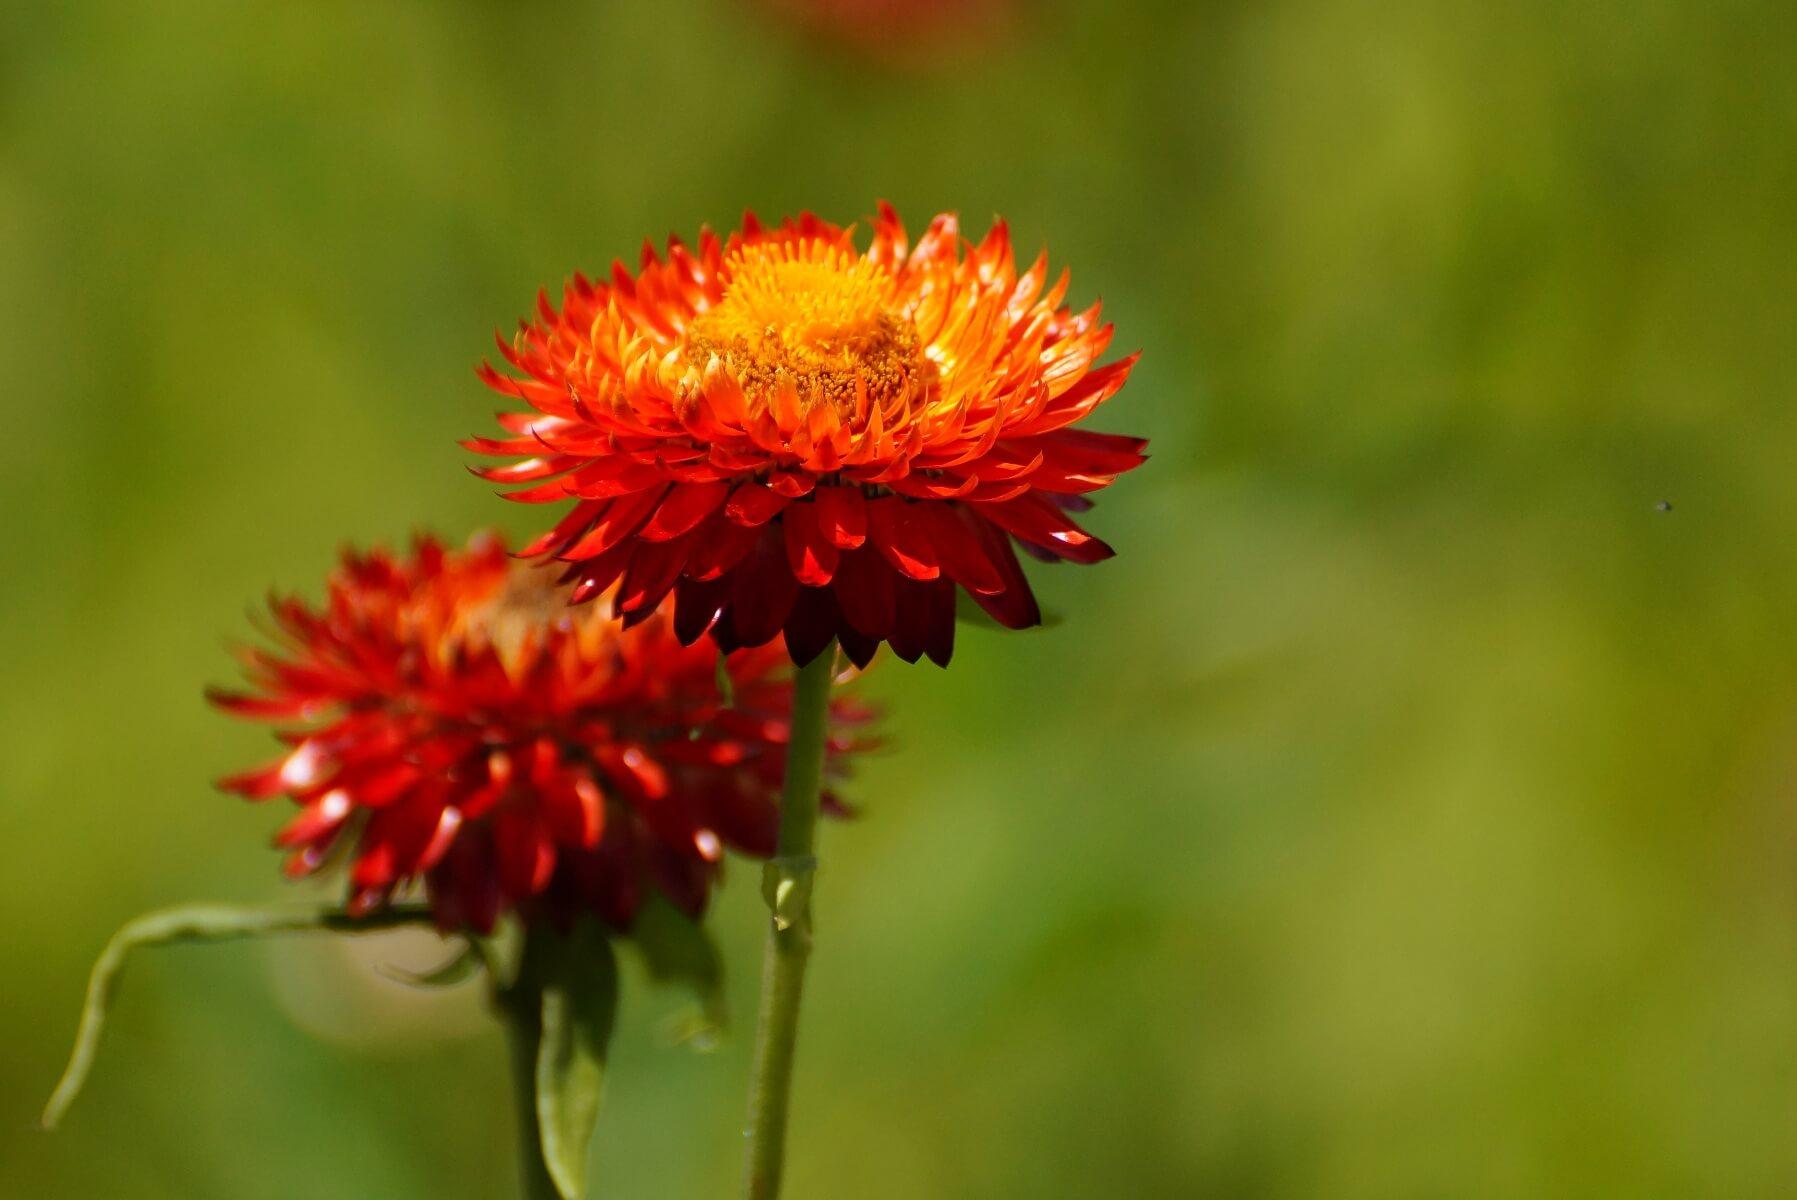 Helichrysum bracteatum – kocanki ogrodowe, nieśmiertelnik